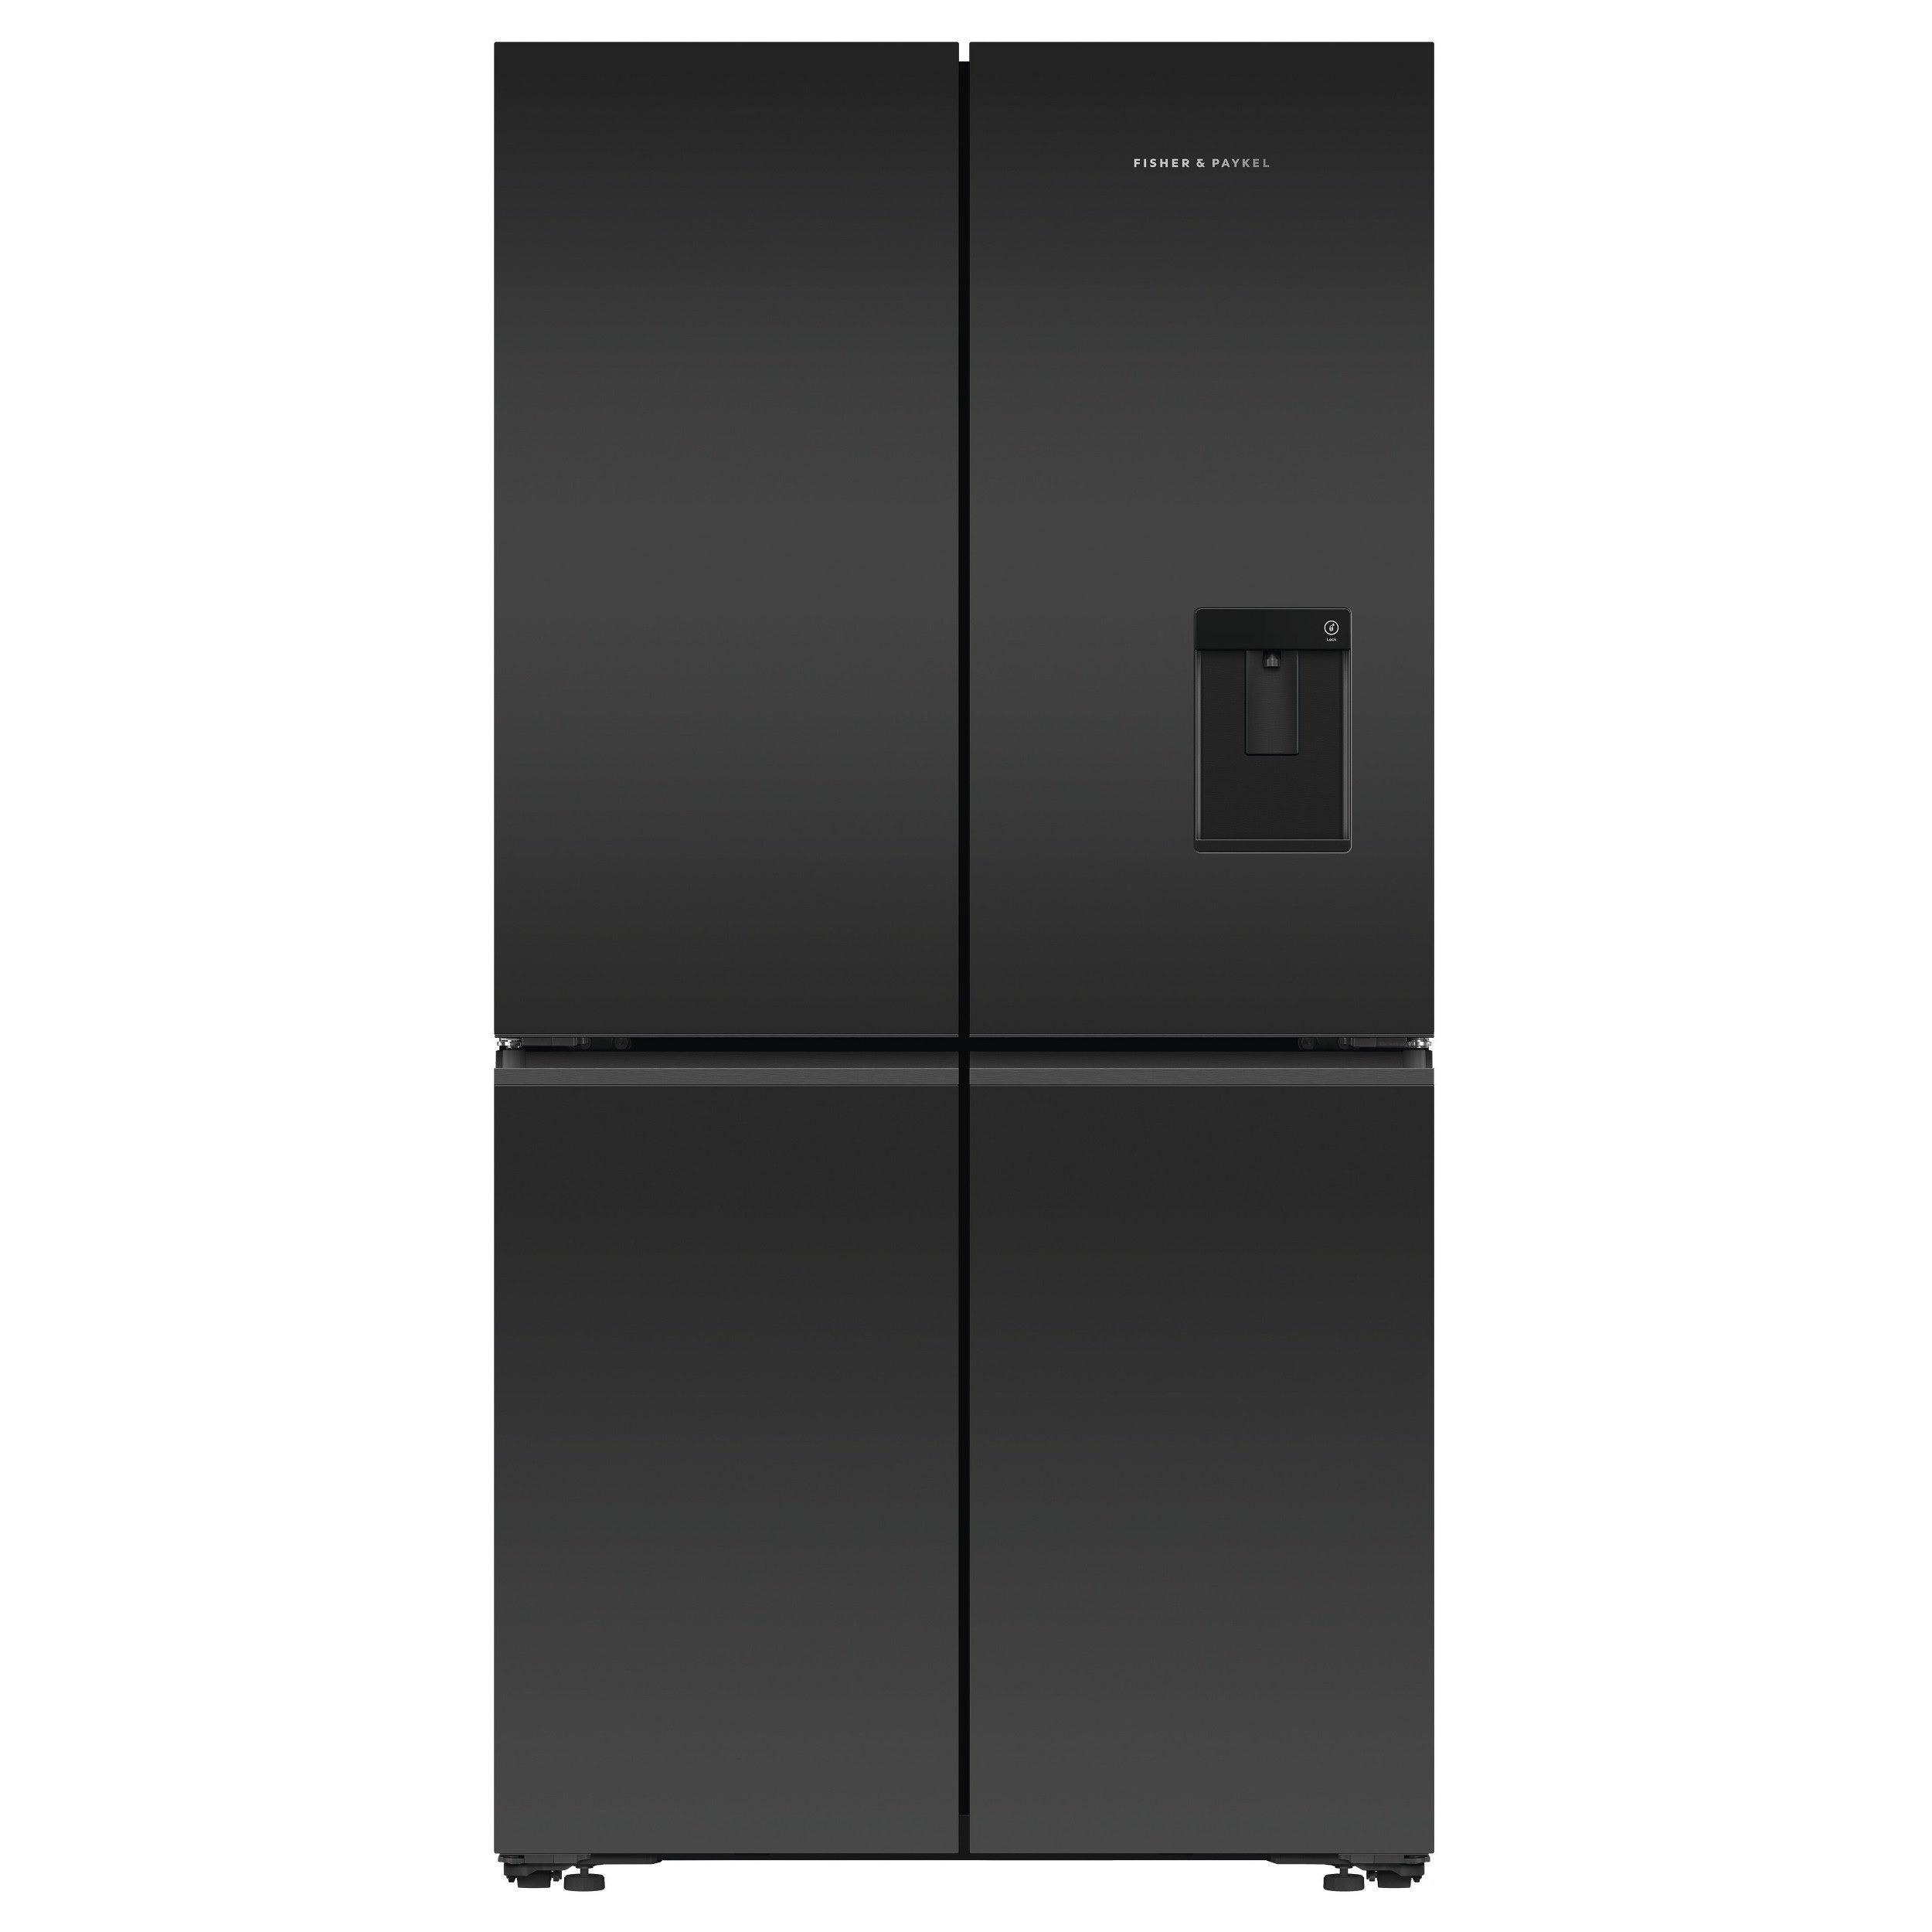 Fisher & Paykel RF605QZUVB1 Refrigerator